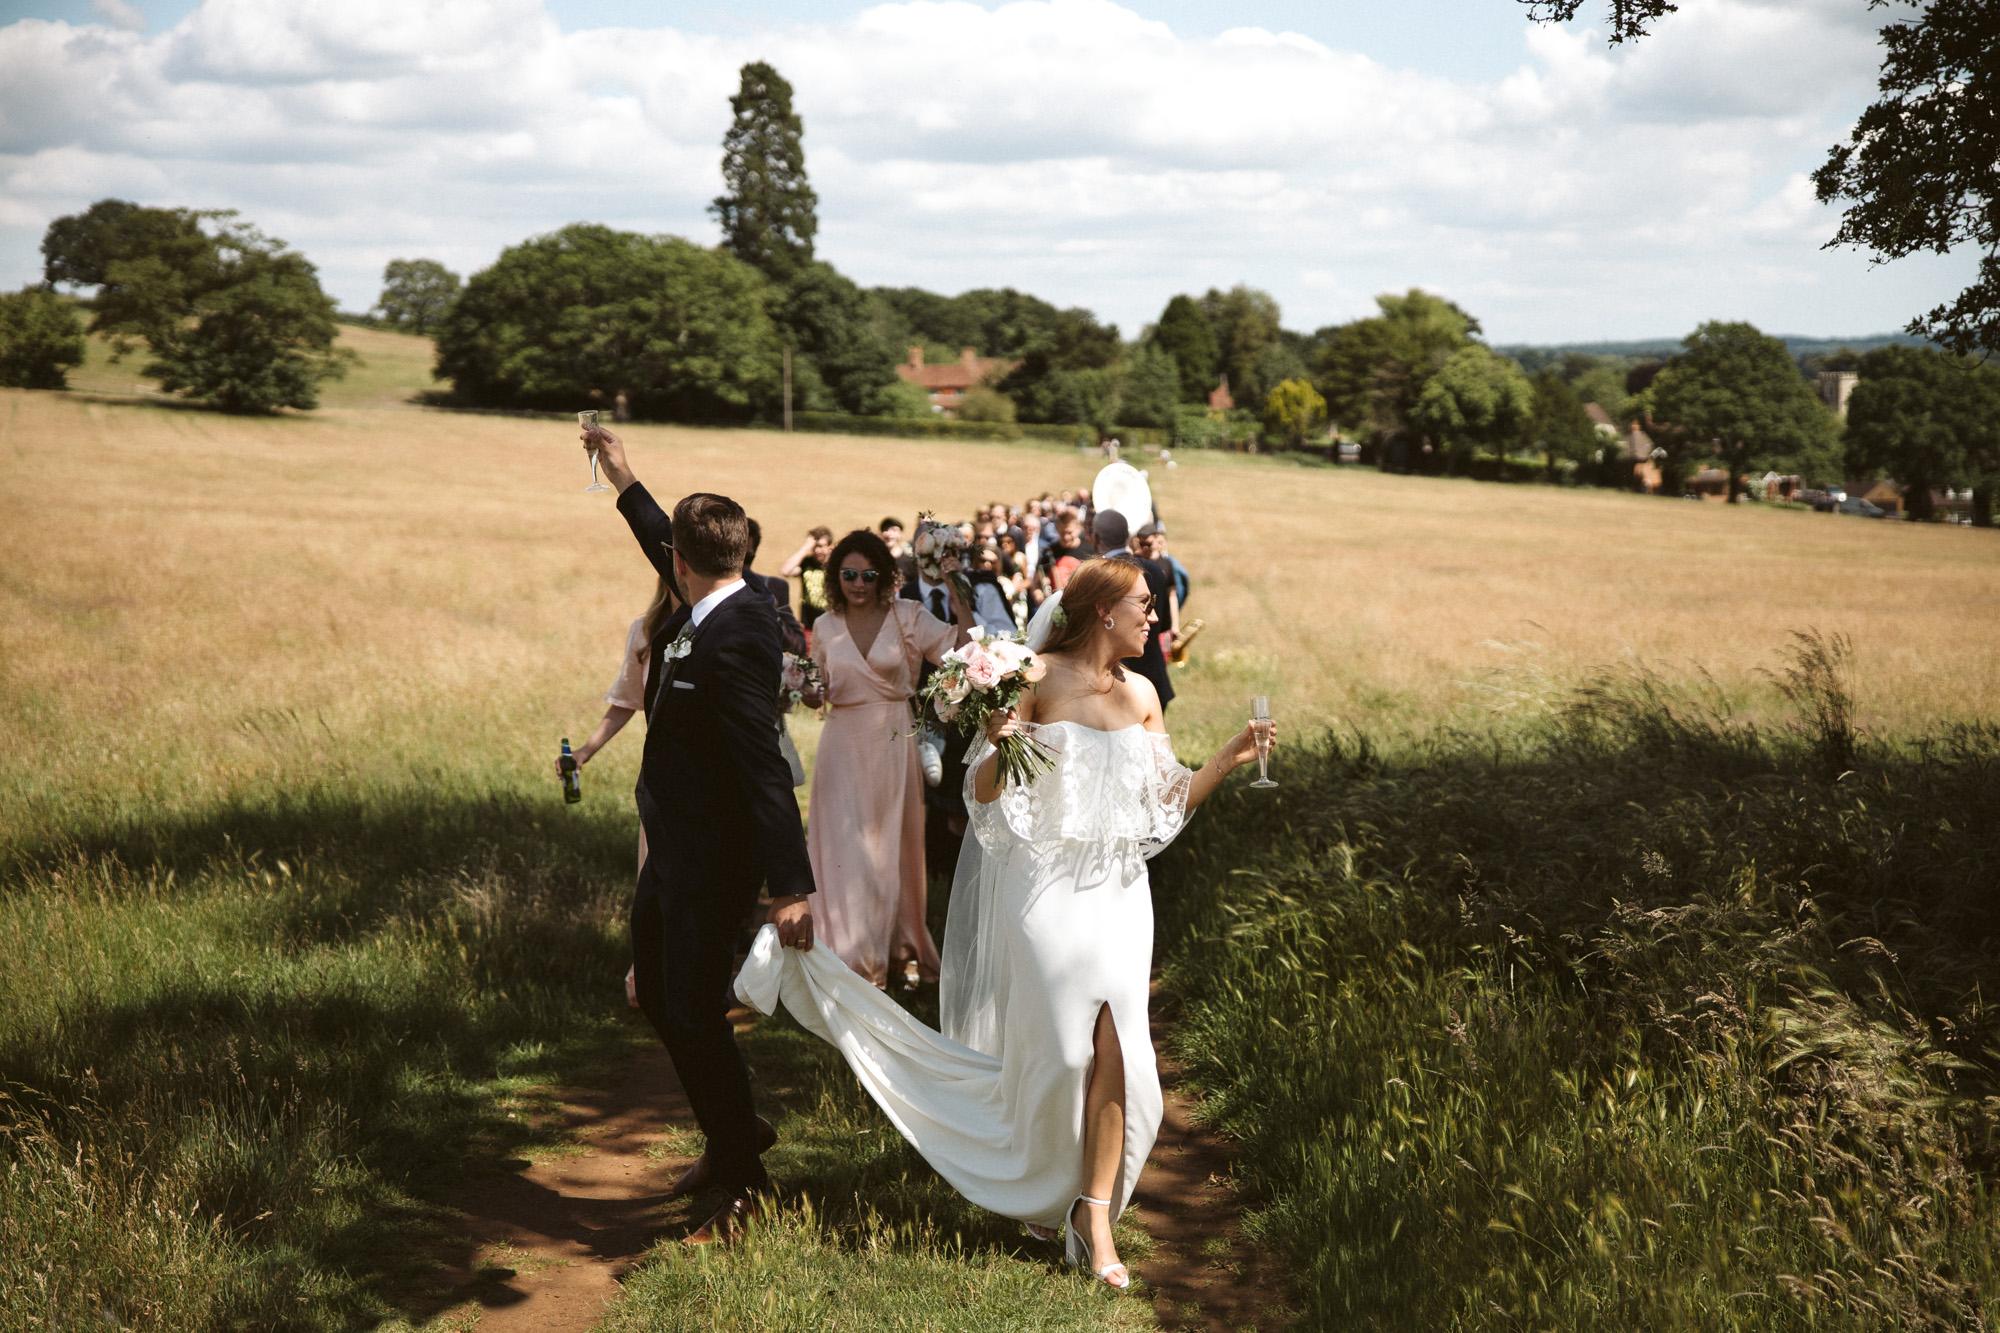 A couple getting married in one of Fiesta Fields venues